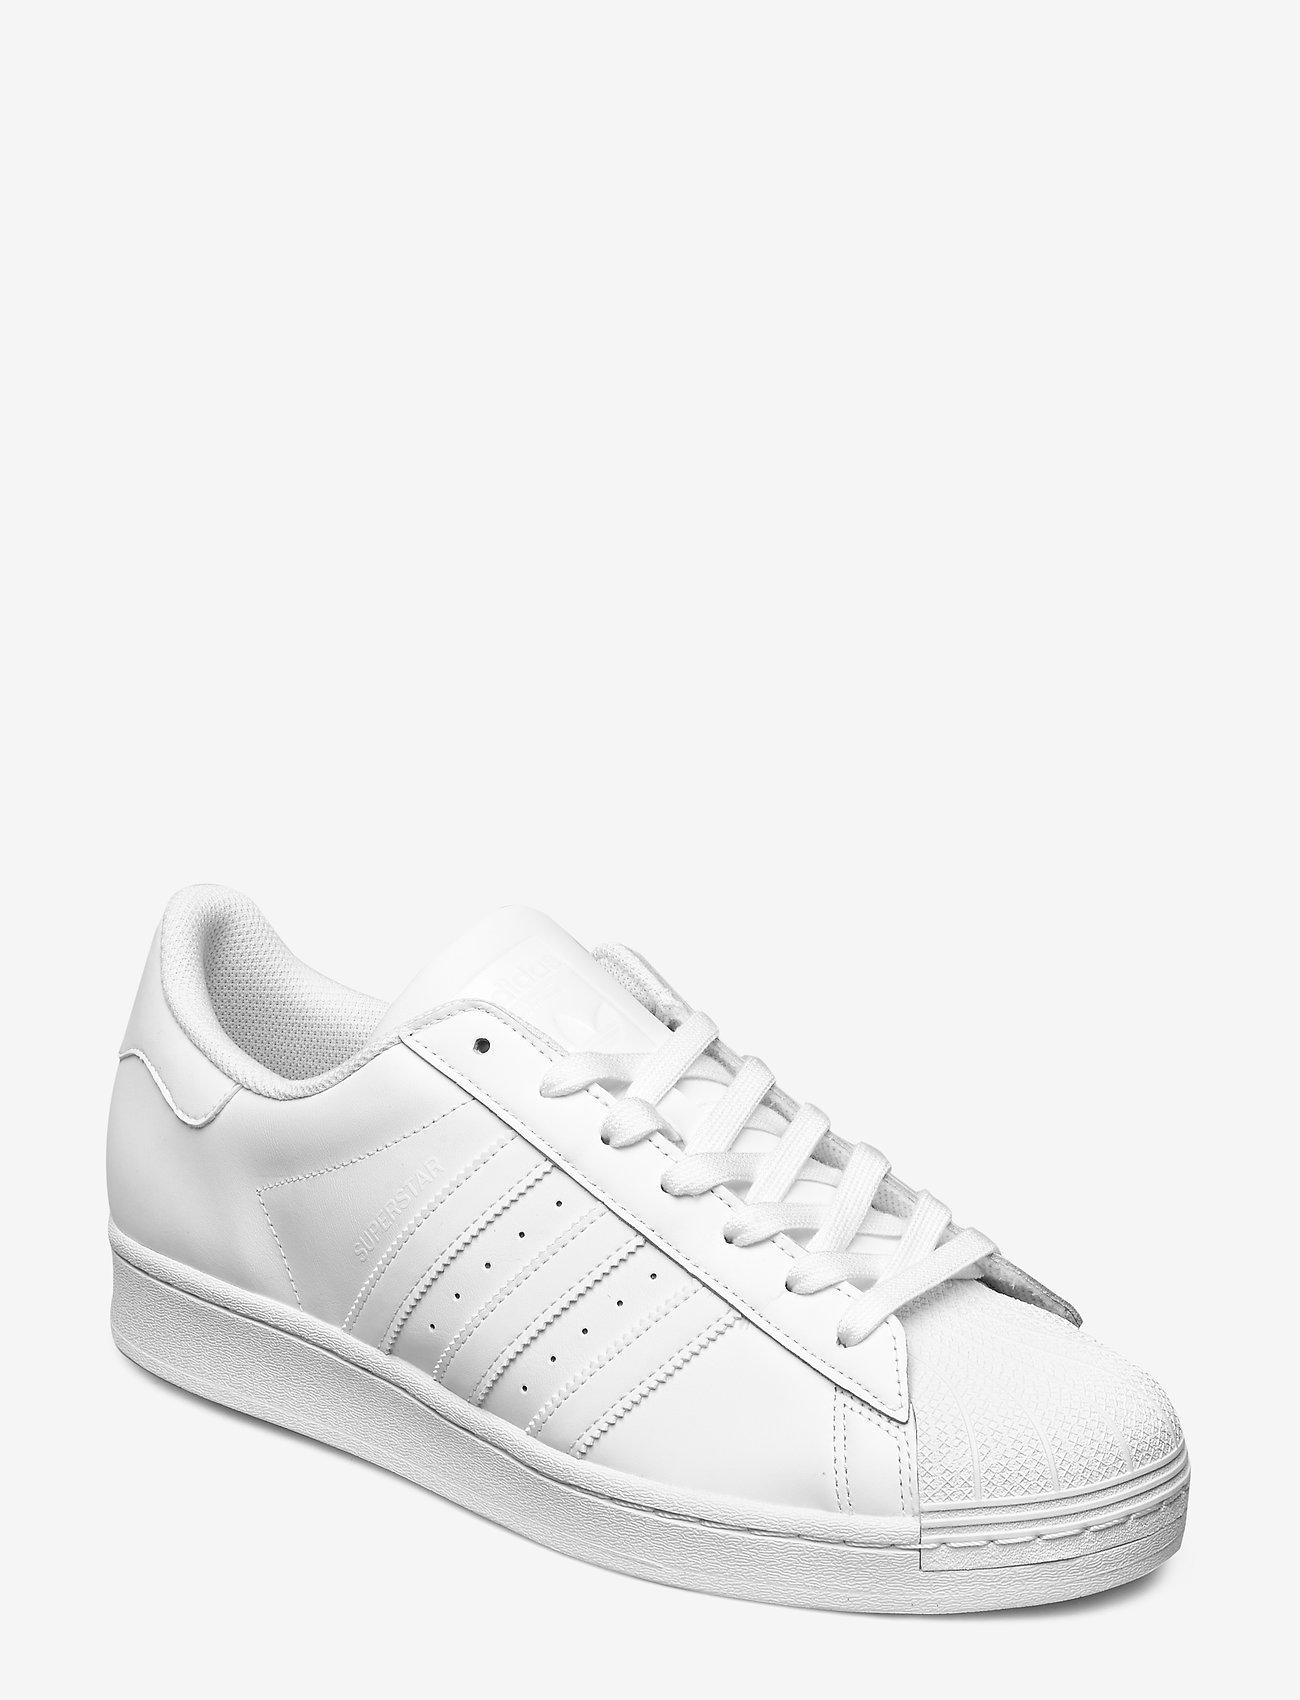 adidas Originals - Superstar - lav ankel - ftwwht/ftwwht/ftwwht - 0